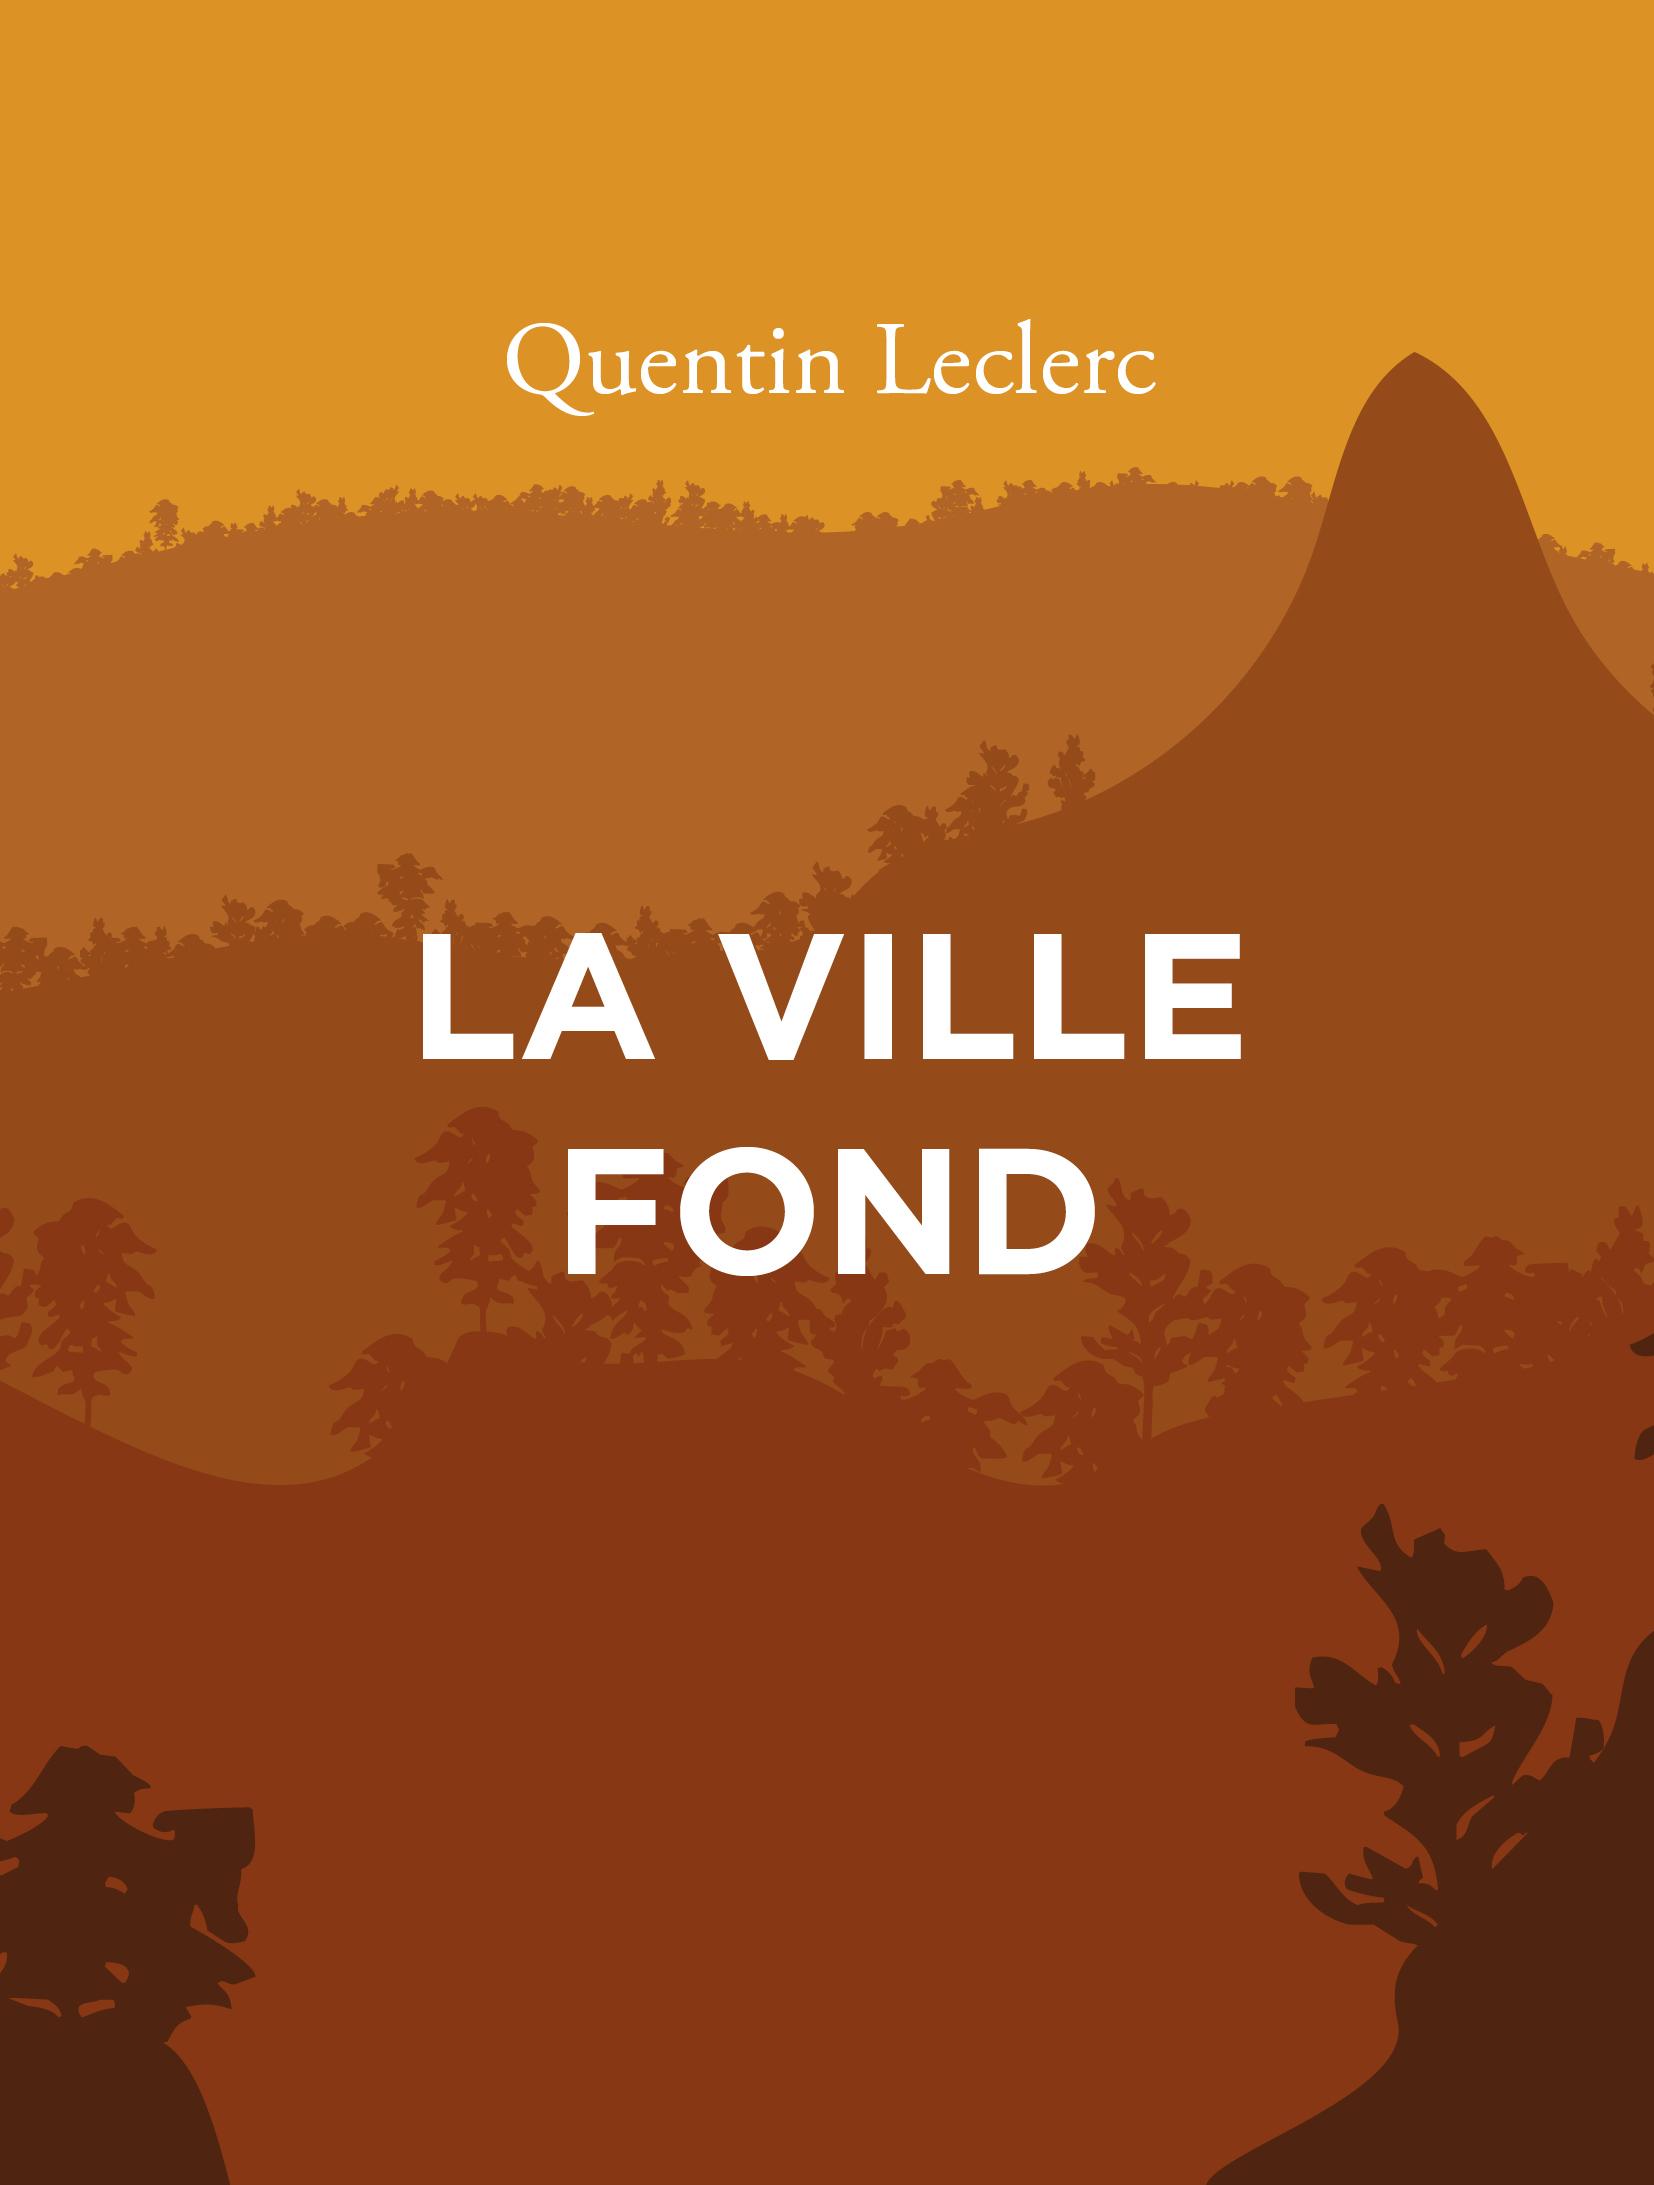 La ville fond - Quentin Leclerc - Editions L'Ogre